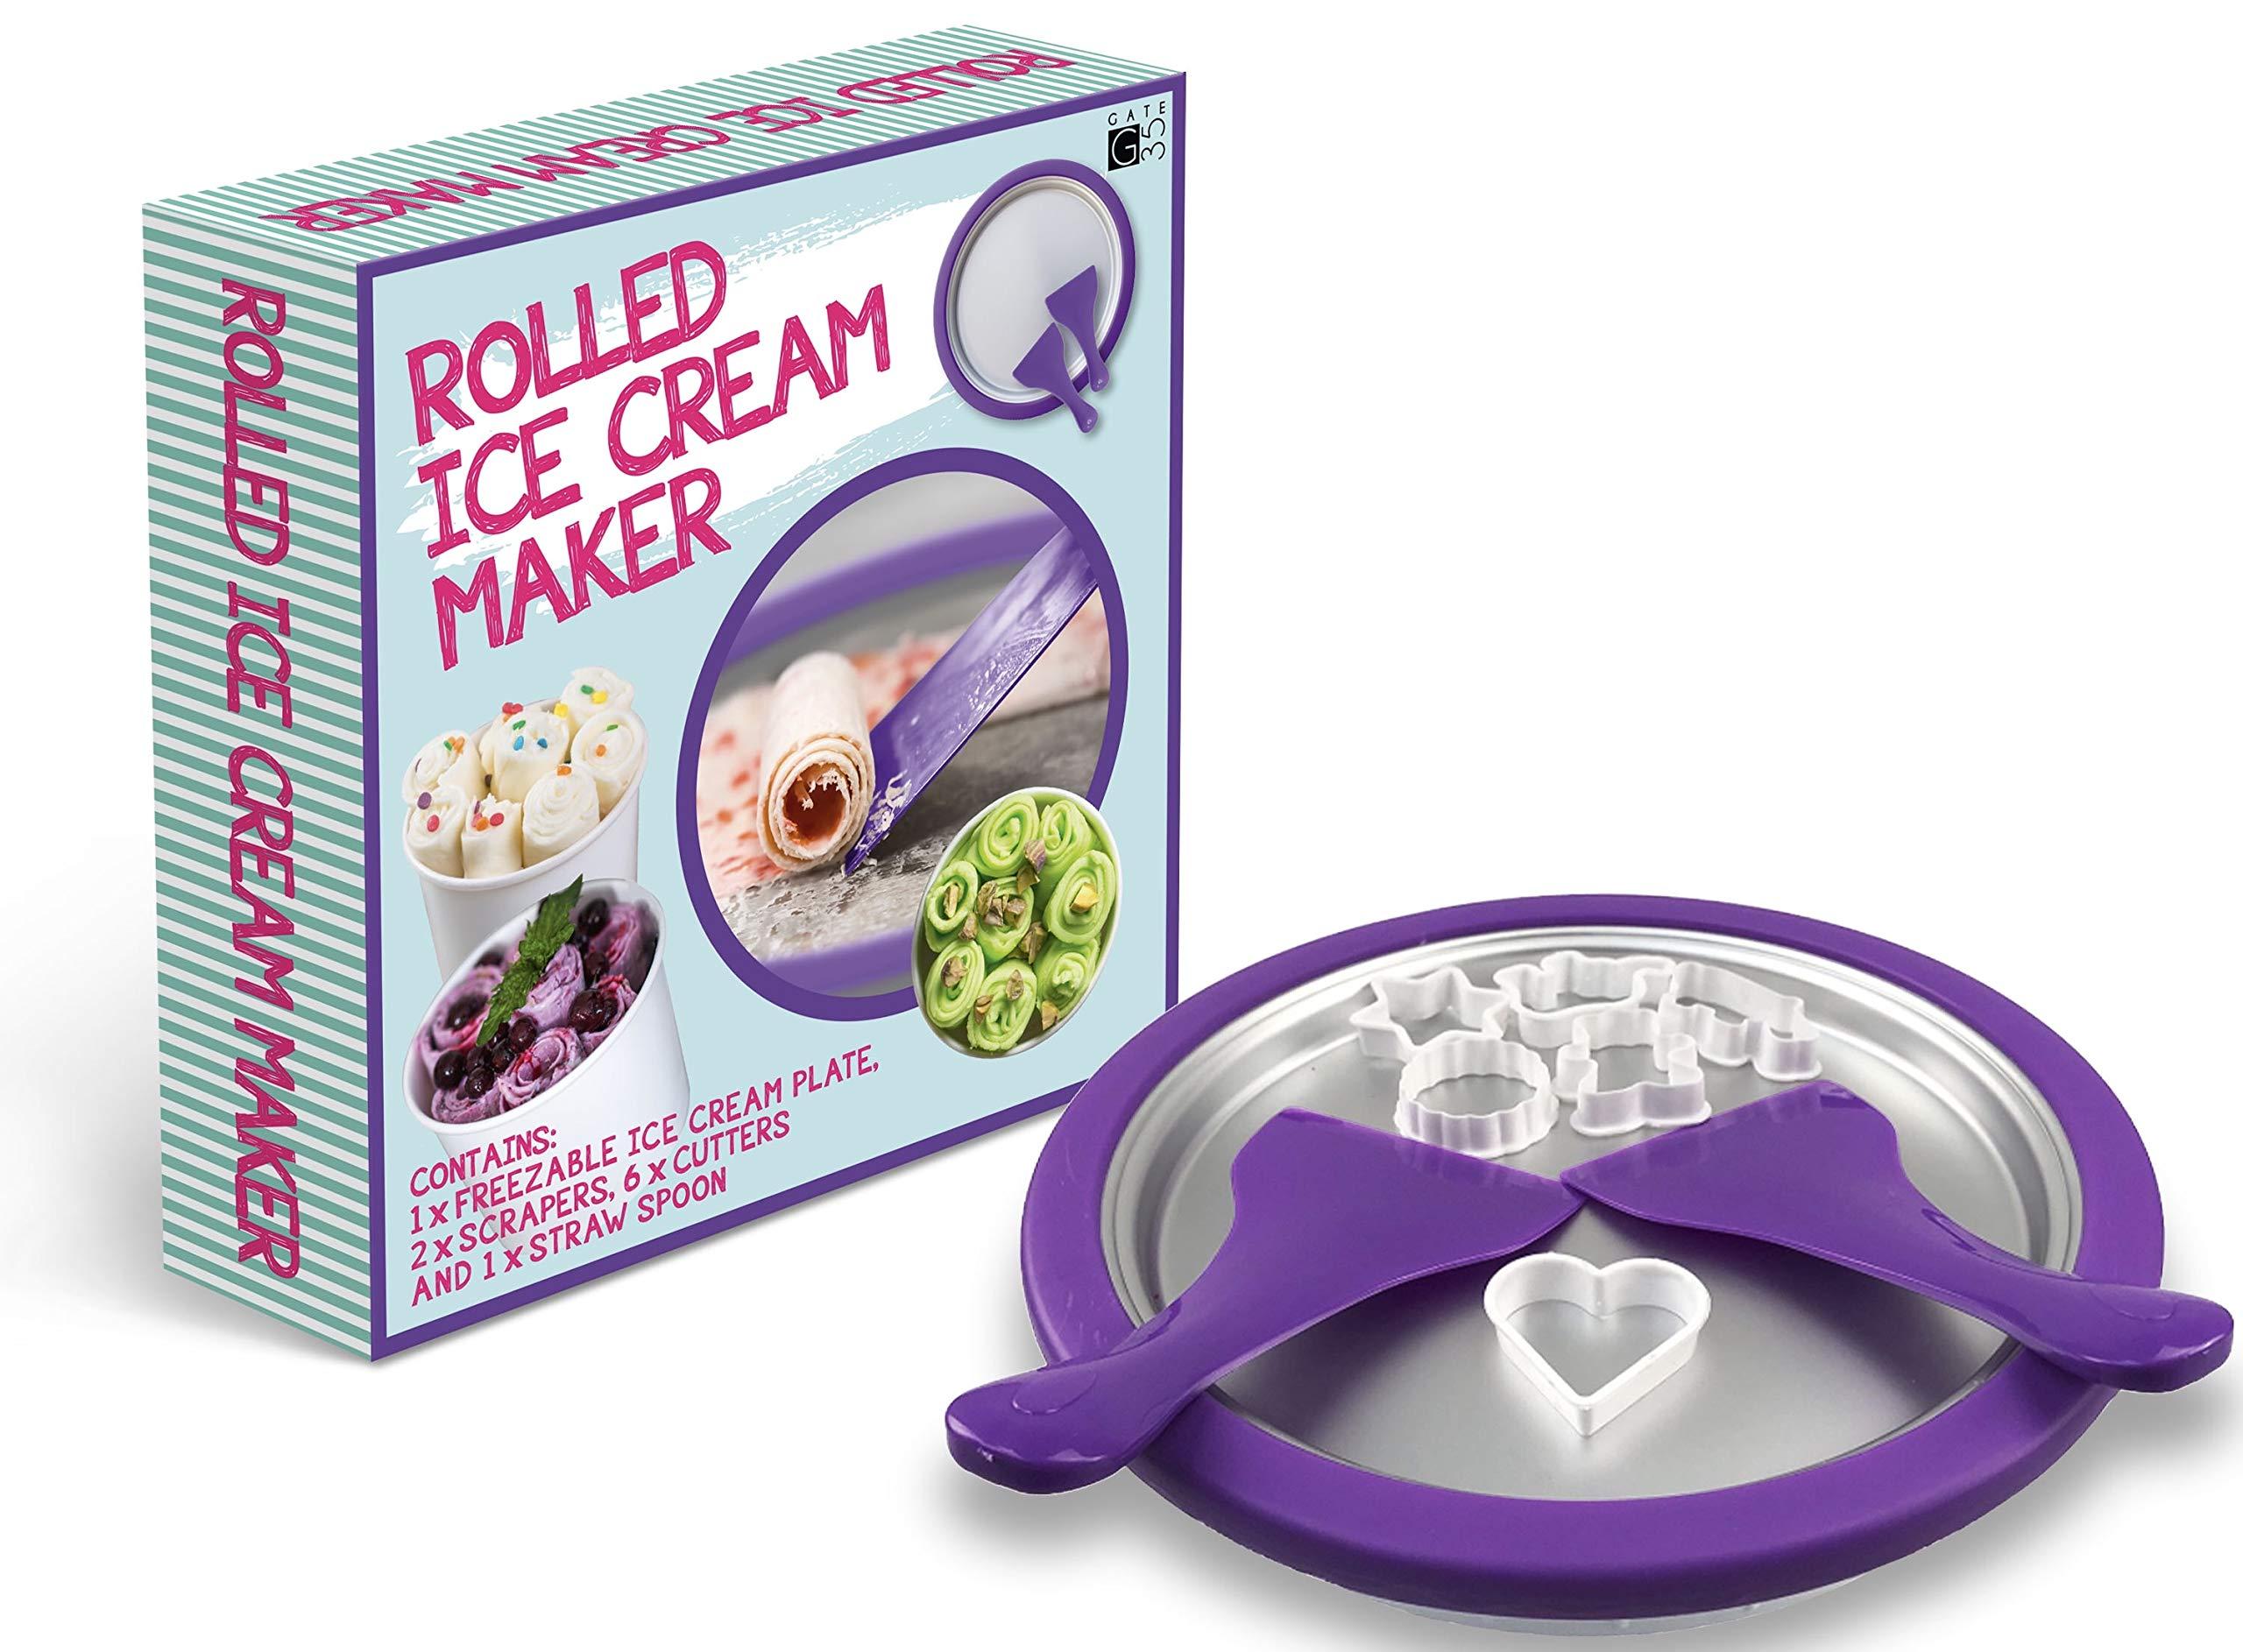 Ice Cream Roll Maker - Make Amazing Ice Cream Desserts at Home in an Instant - Food Grade DIY Rolled Ice Cream, Frozen Yogurt Grill